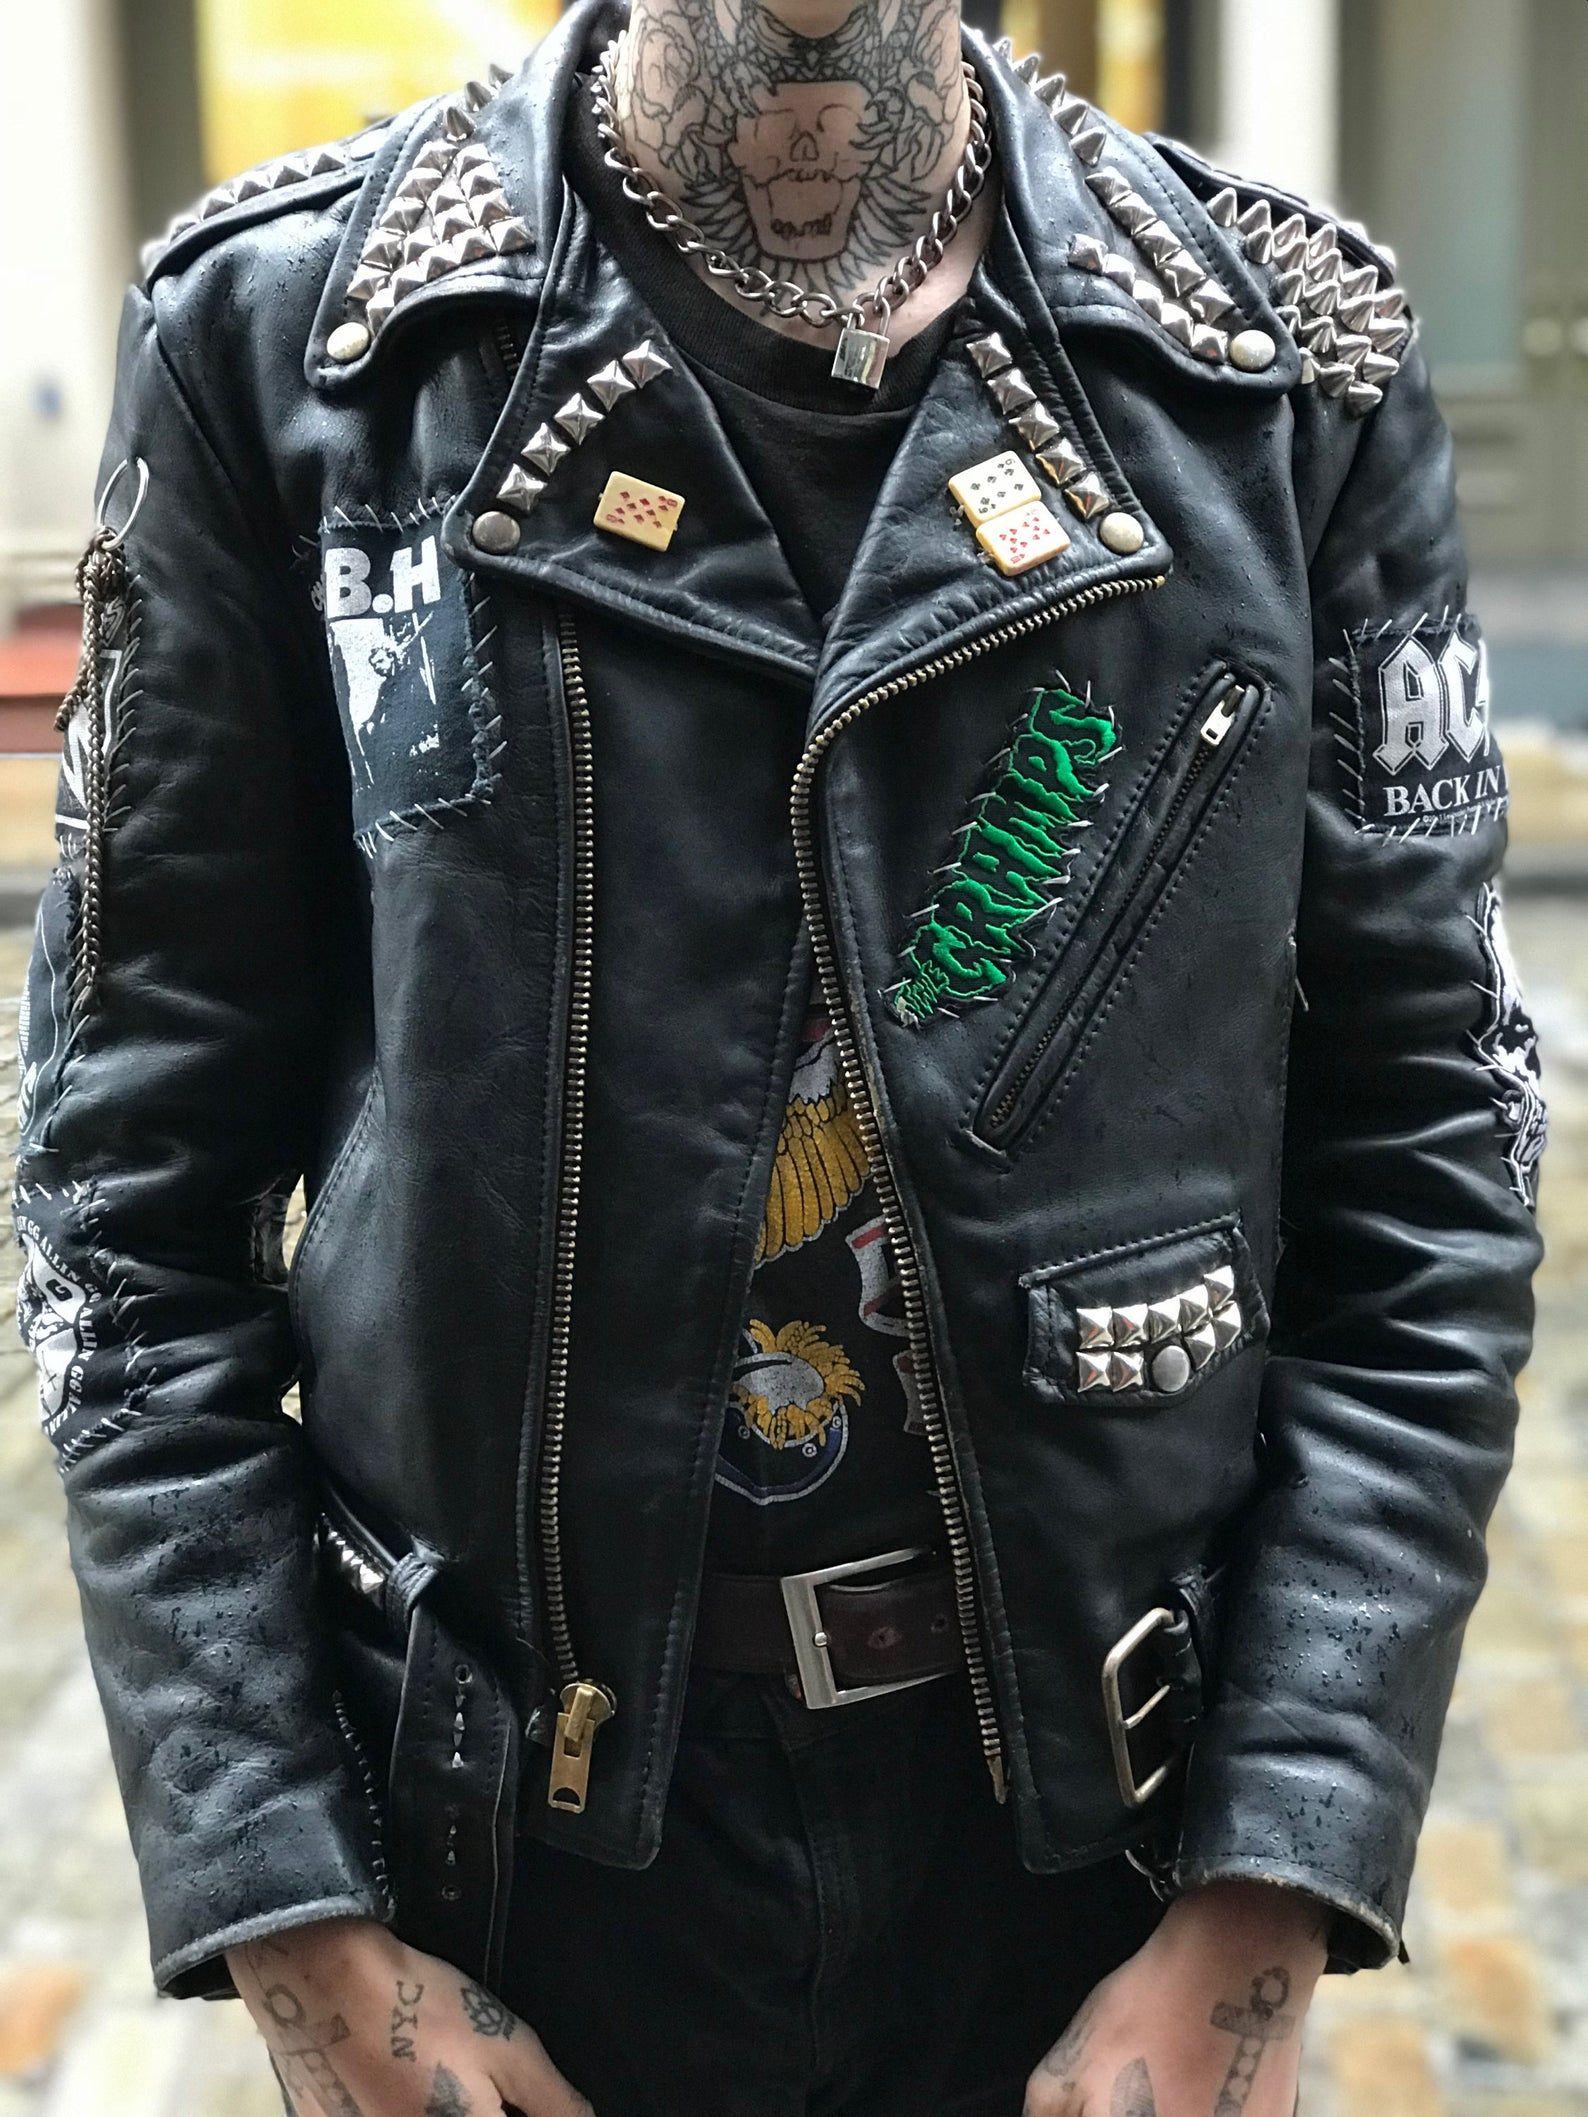 Vintage Punk Leather Studded Moto Jacket Etsy in 2020